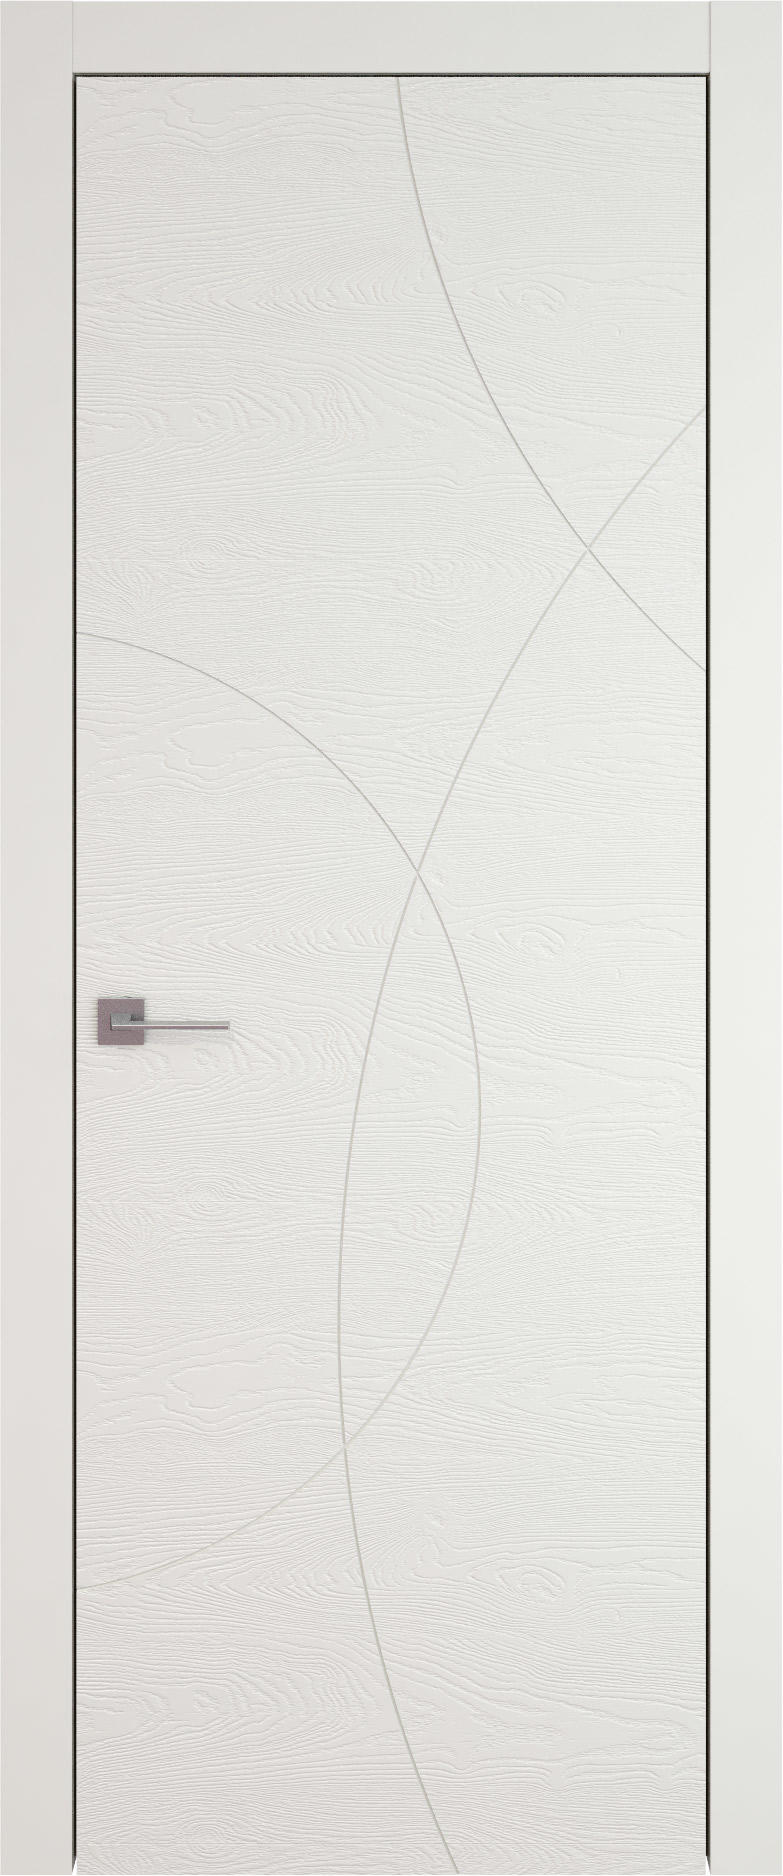 Tivoli Б-5 цвет - Бежевая эмаль по шпону (RAL 9010) Без стекла (ДГ)